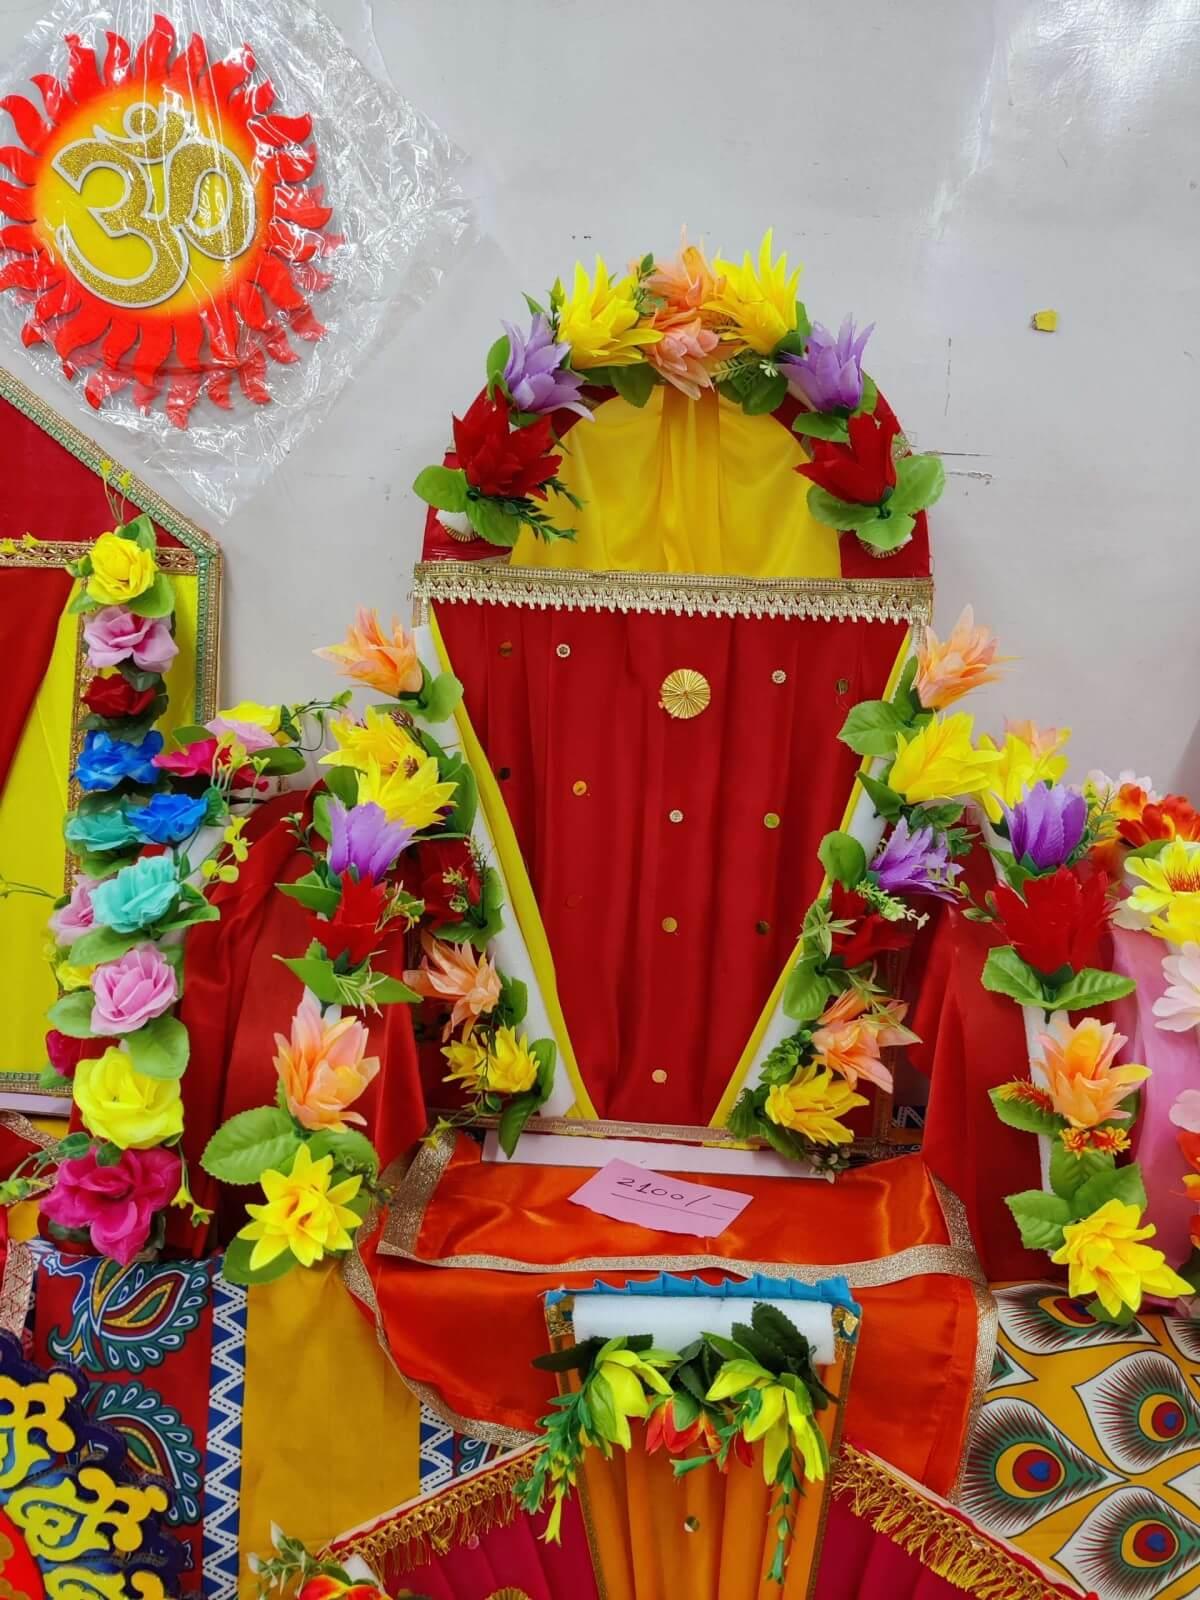 Ganpati Makhar paper flowers and lights